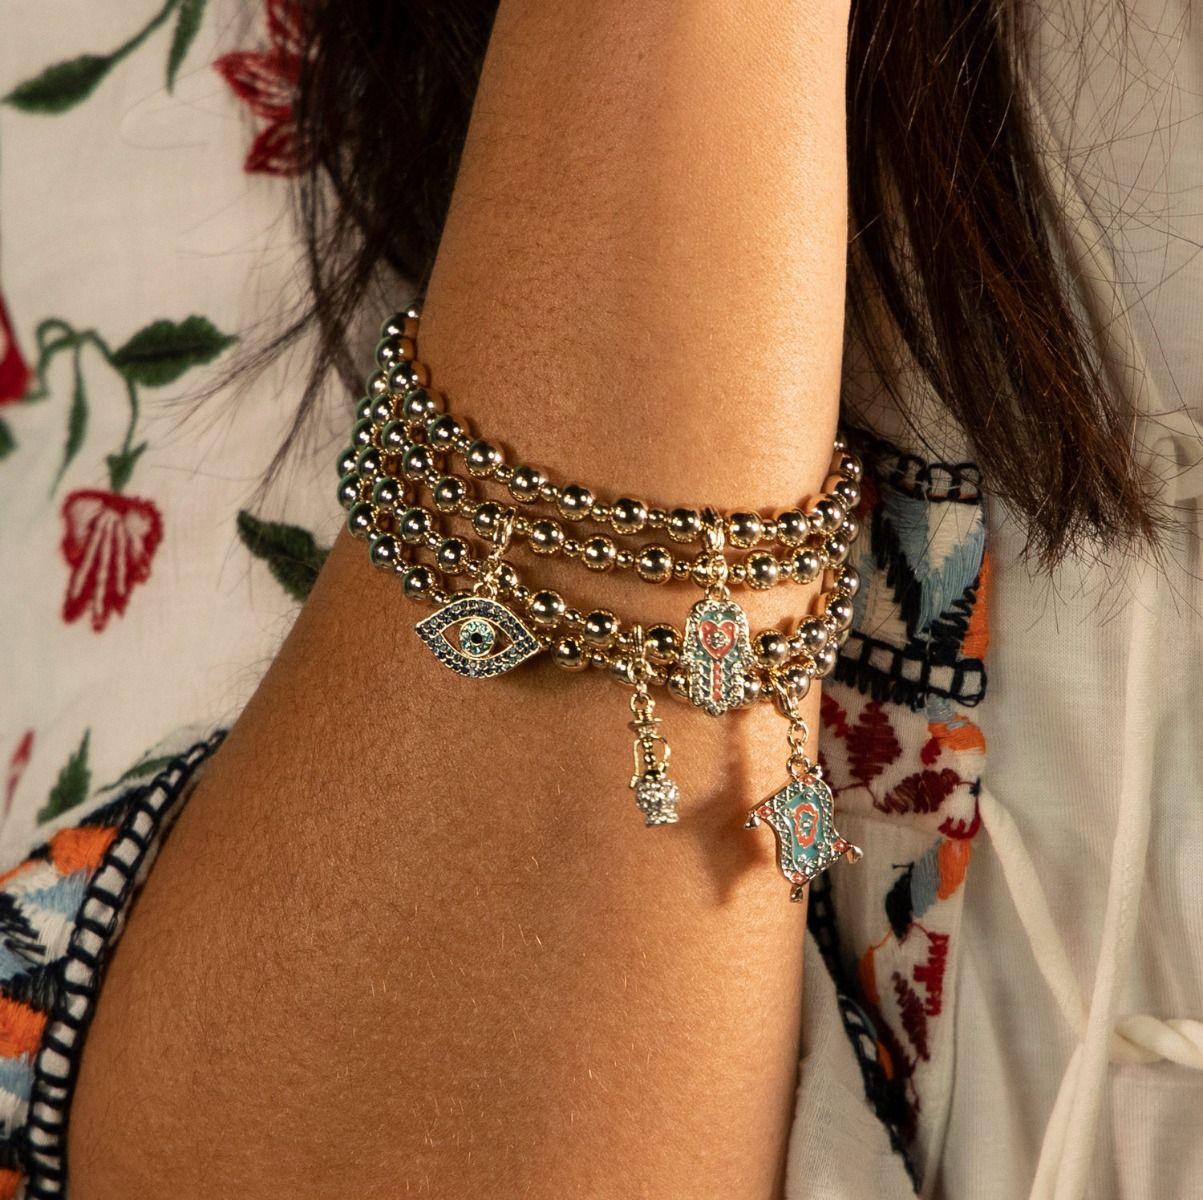 Buckley London Shisha Pipe Charm Bracelet